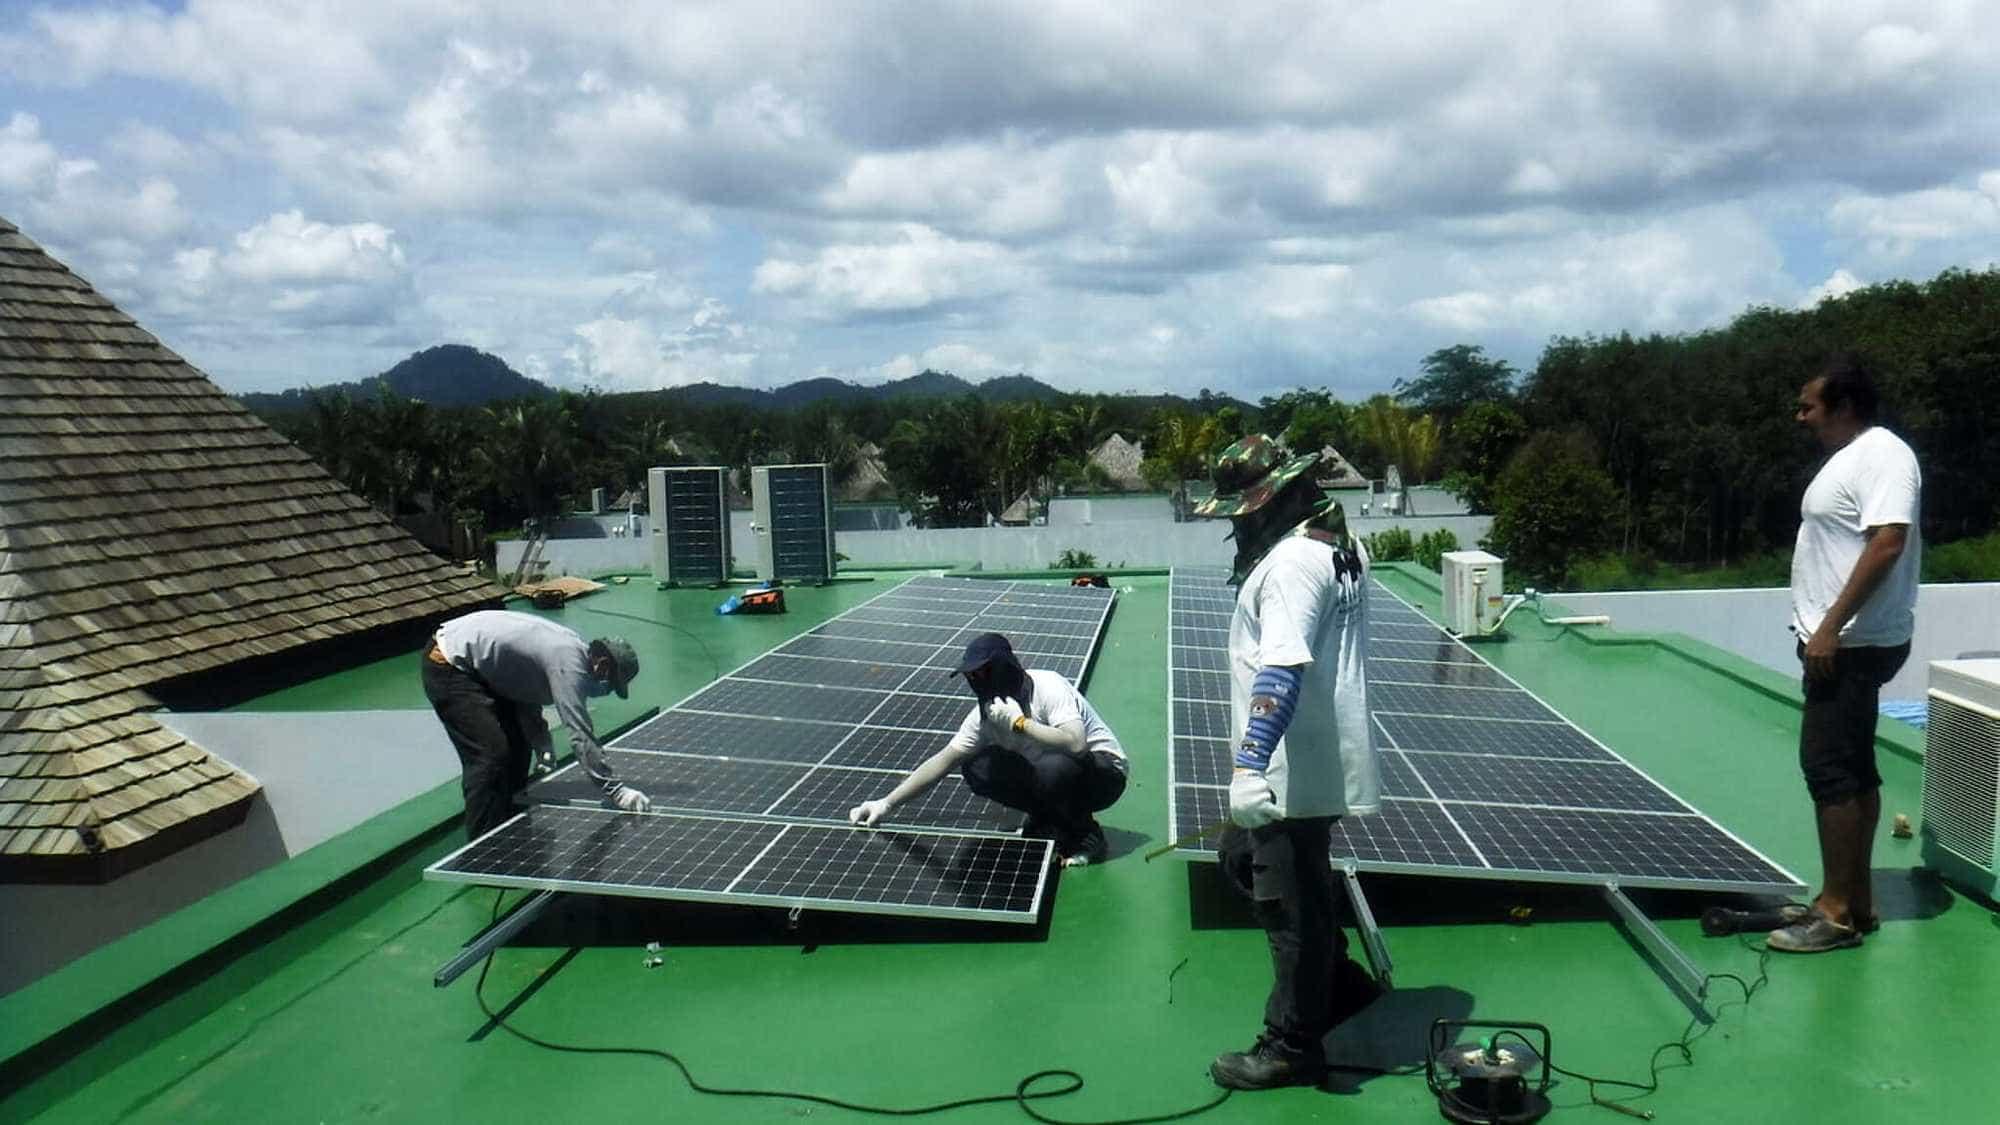 Solar power panels on a shop house roof, Phuket